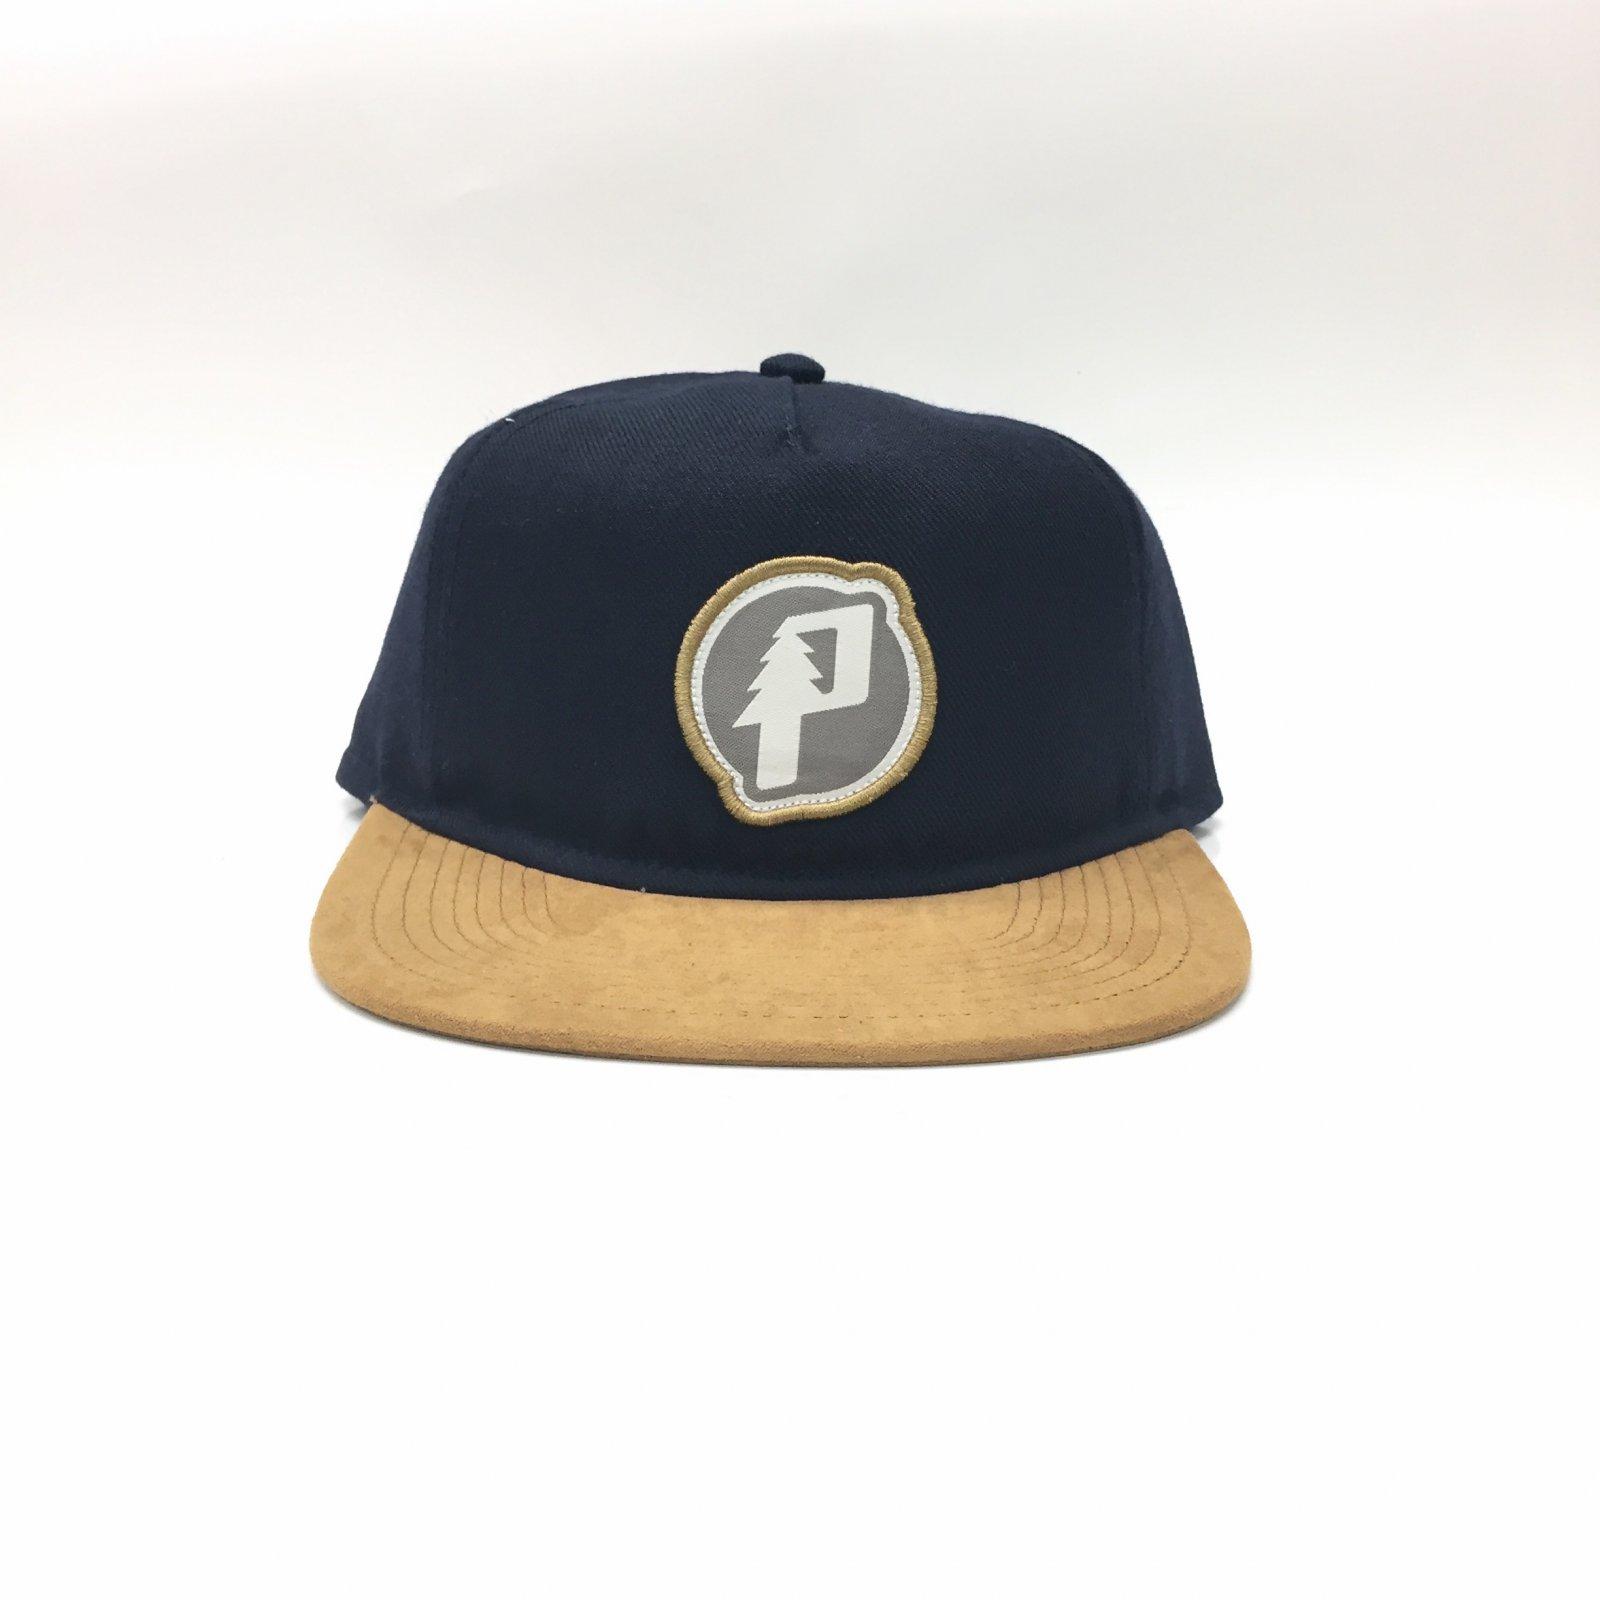 Pinewski's Hat